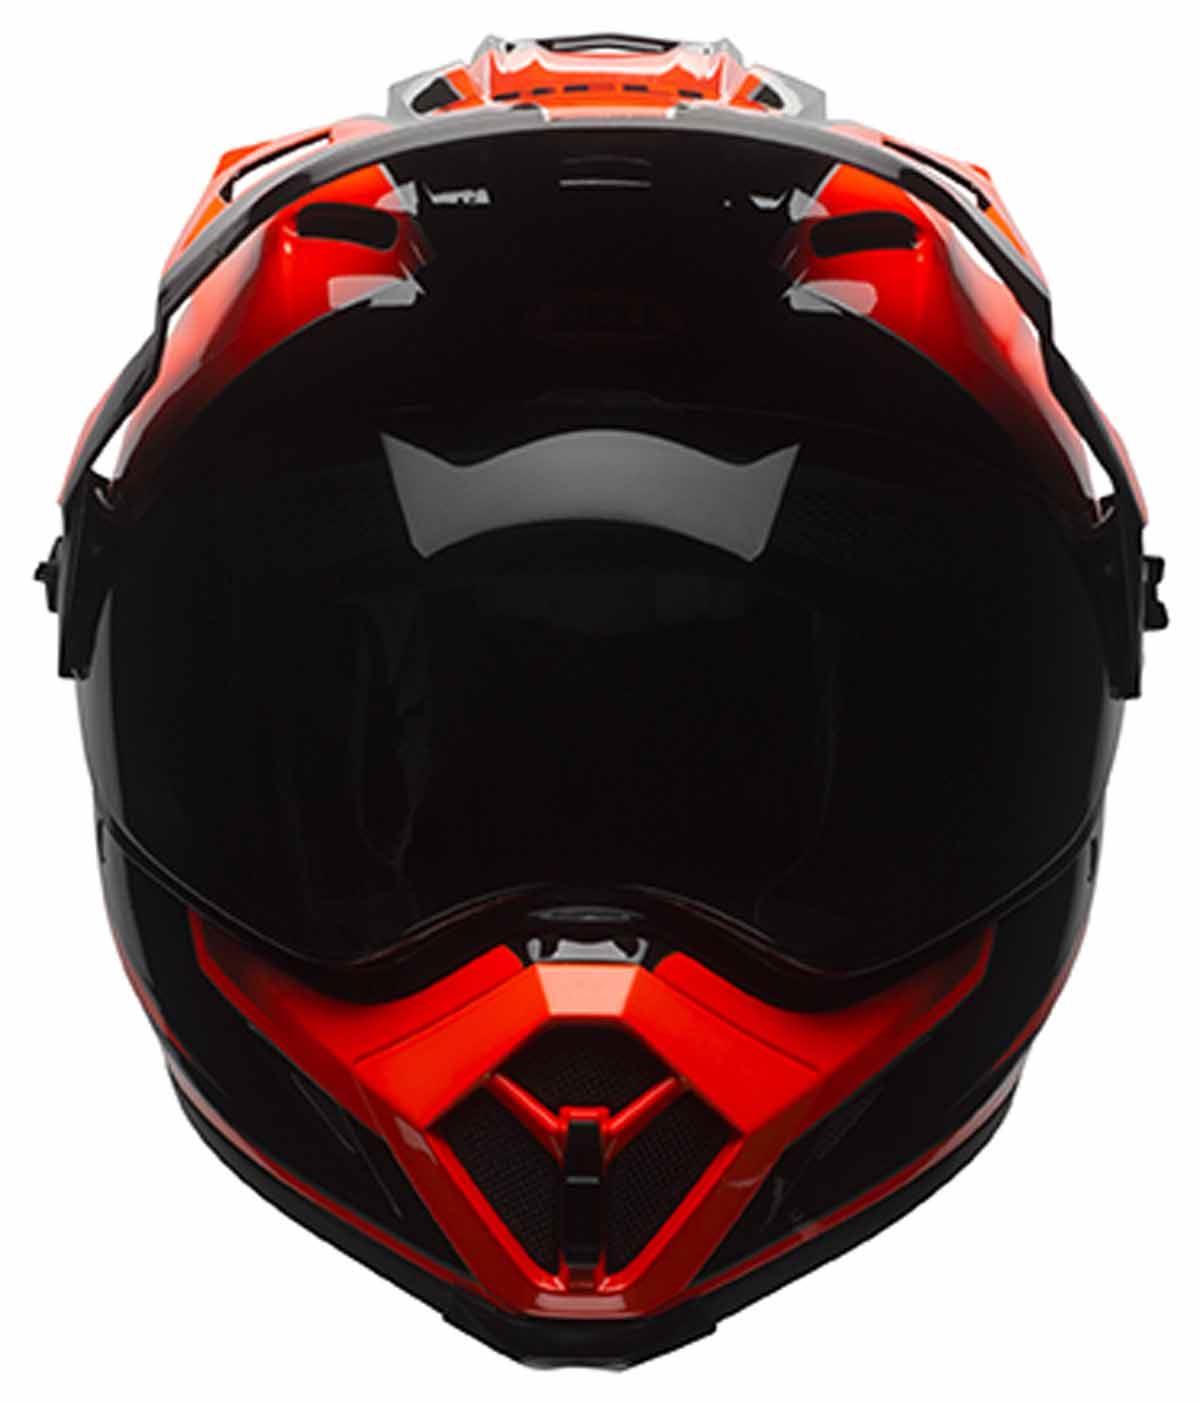 Bell Mx 9 Adv Helmet Advernture Dual Sport Dot Washable